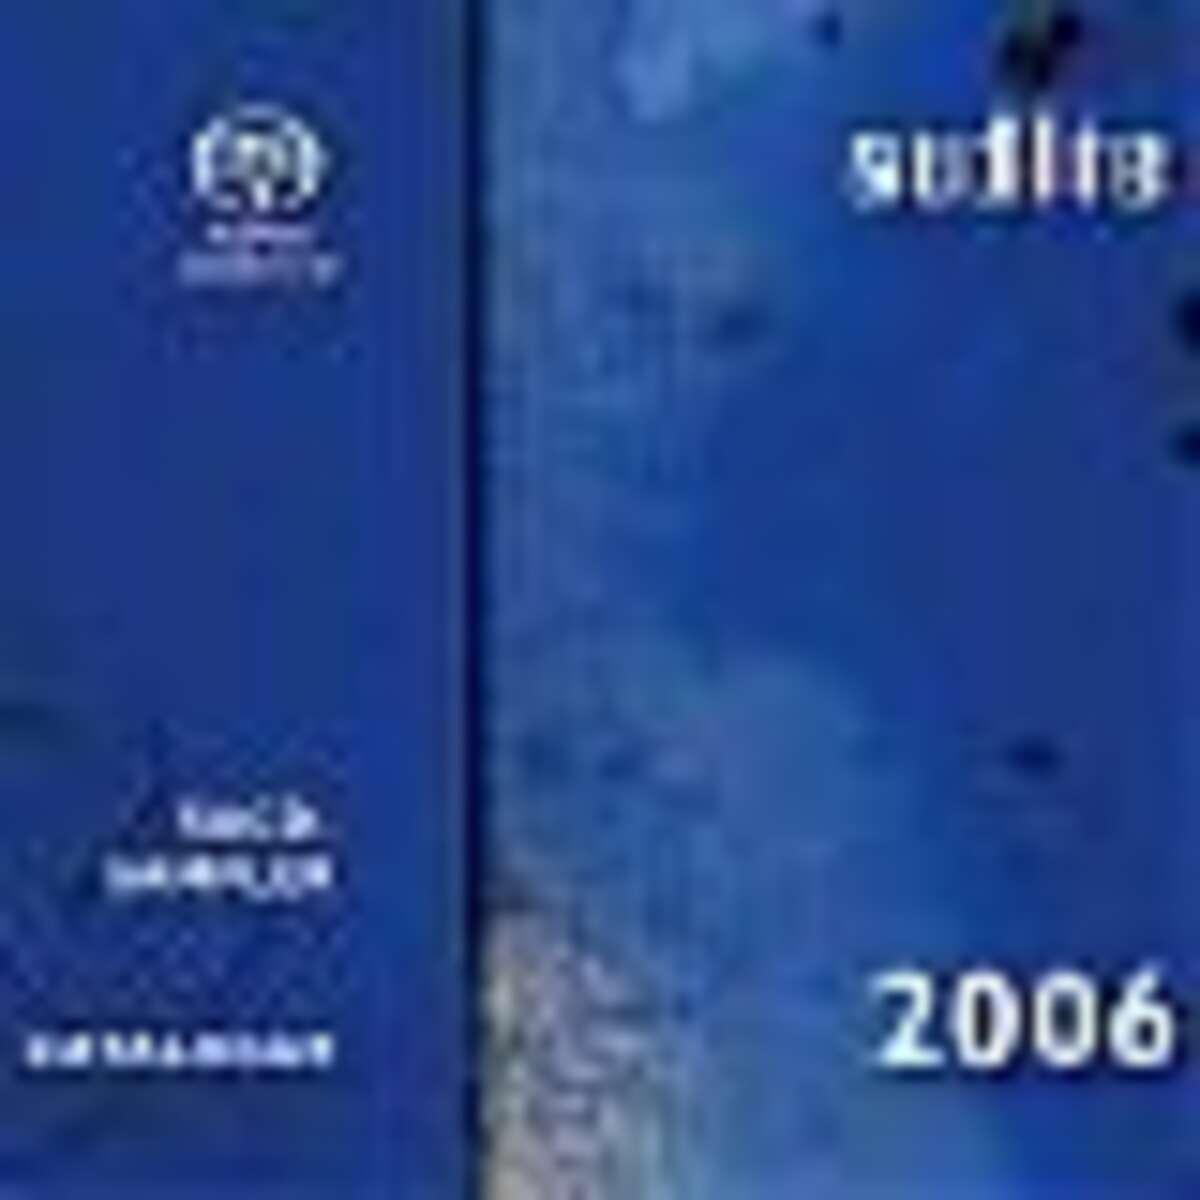 audite catalogue 2006 & sampler